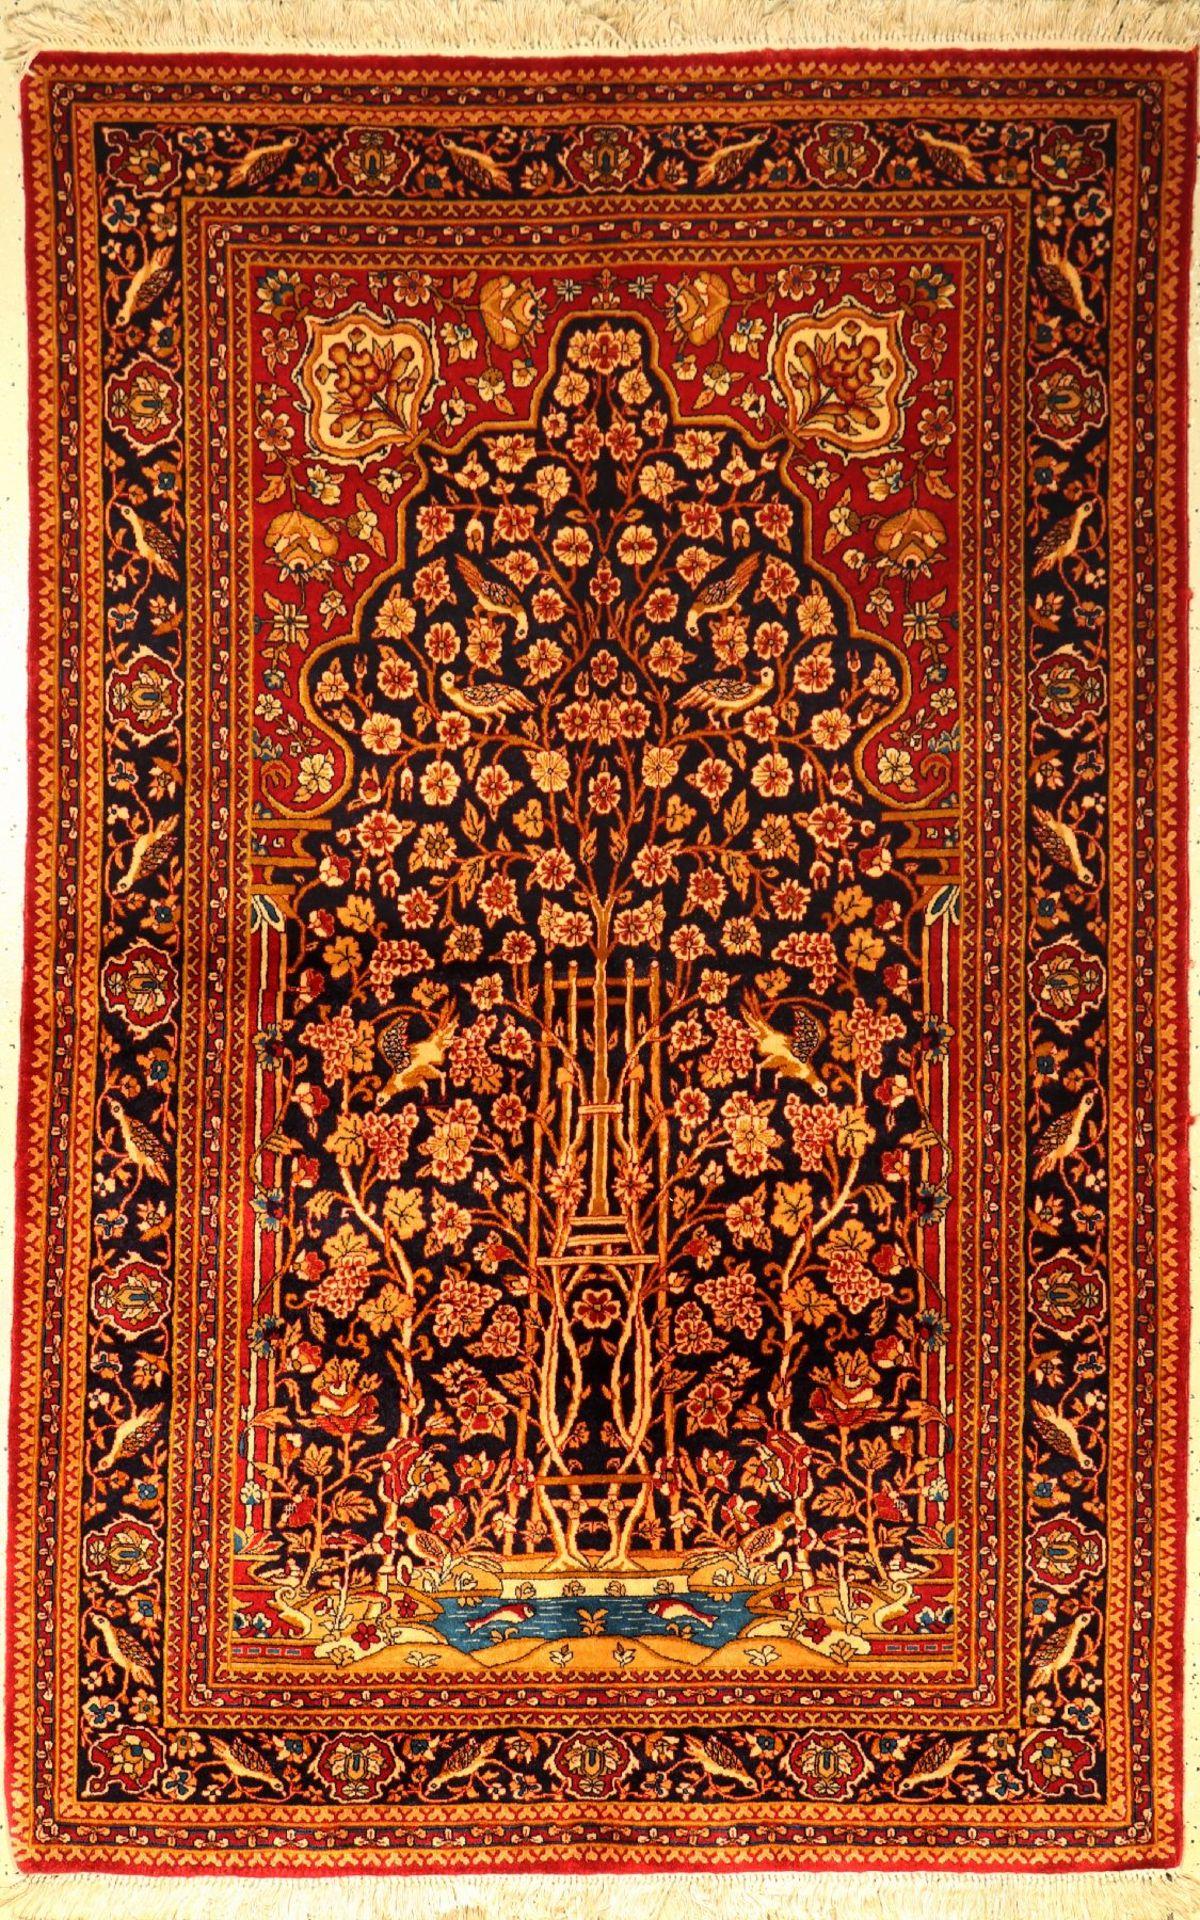 Yazd Sherkat, Persien, ca. 30 Jahre, Korkwolle, ca. 220 x 142 cm, EHZ: 2Yazd Sherkat, Persia,